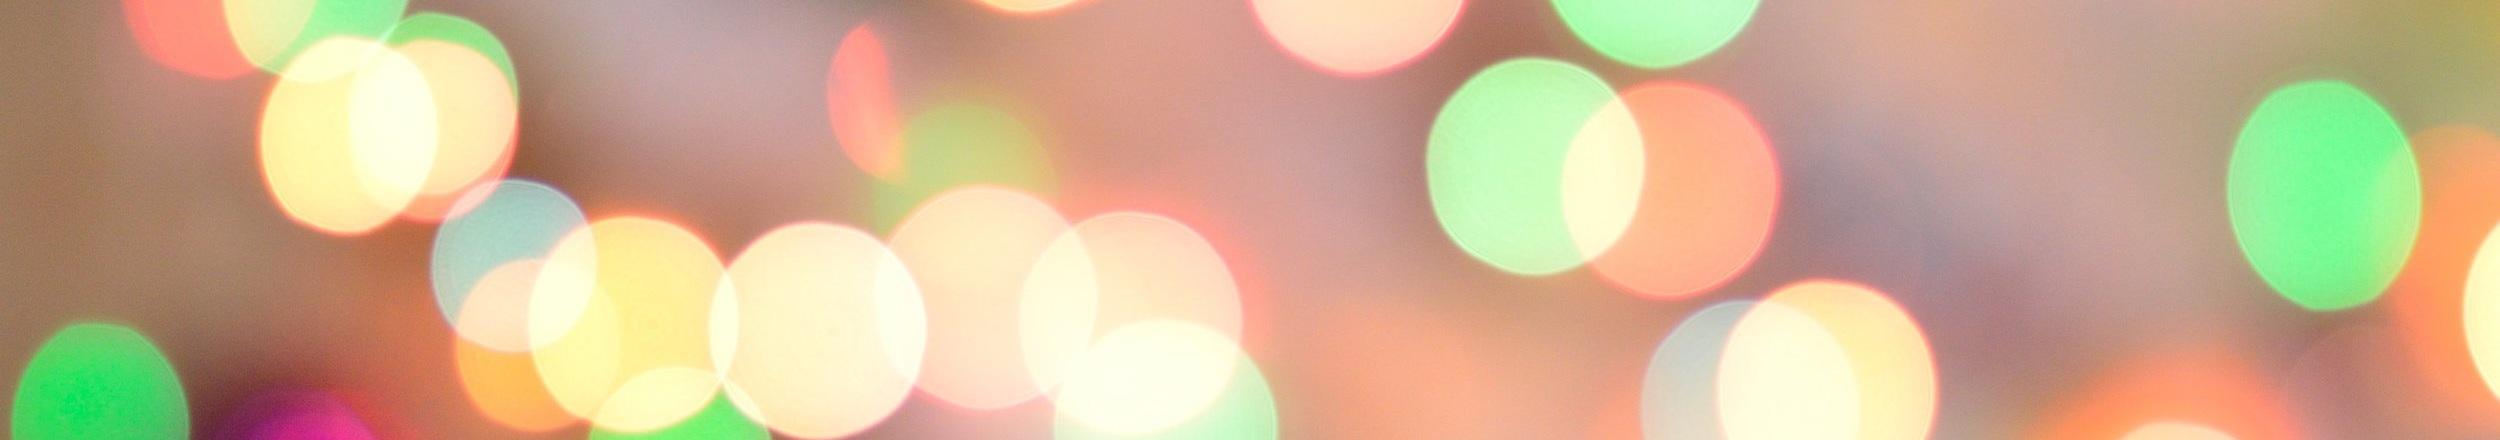 abstract-background-blur-255377.jpg